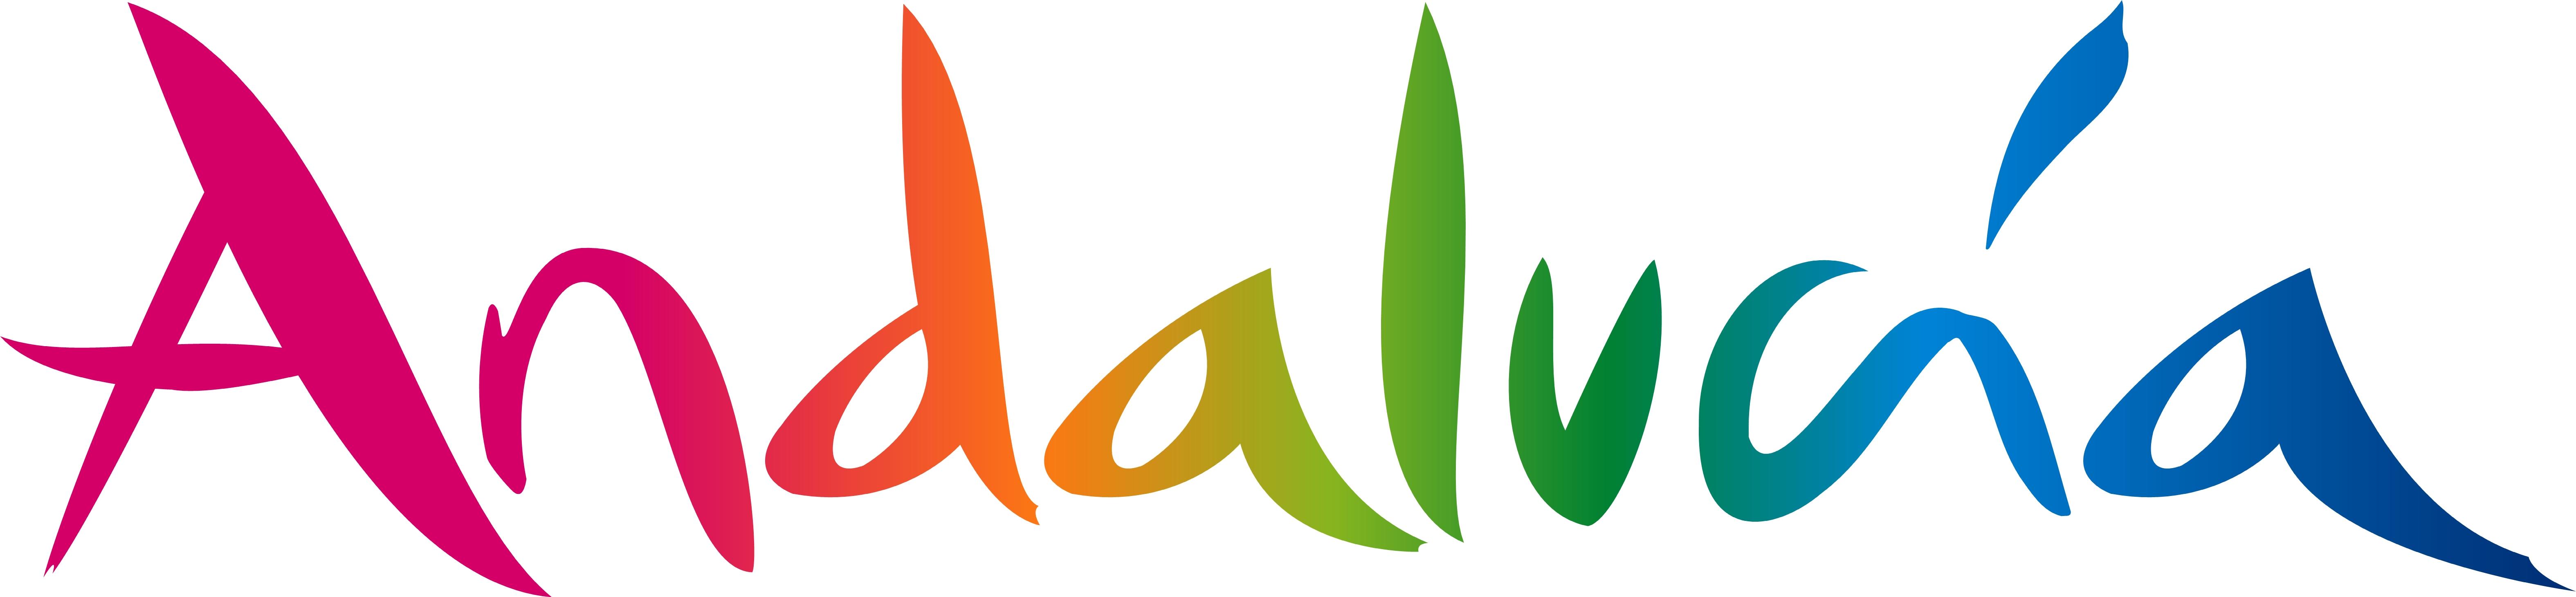 logo_marca_andalucia_mosaico